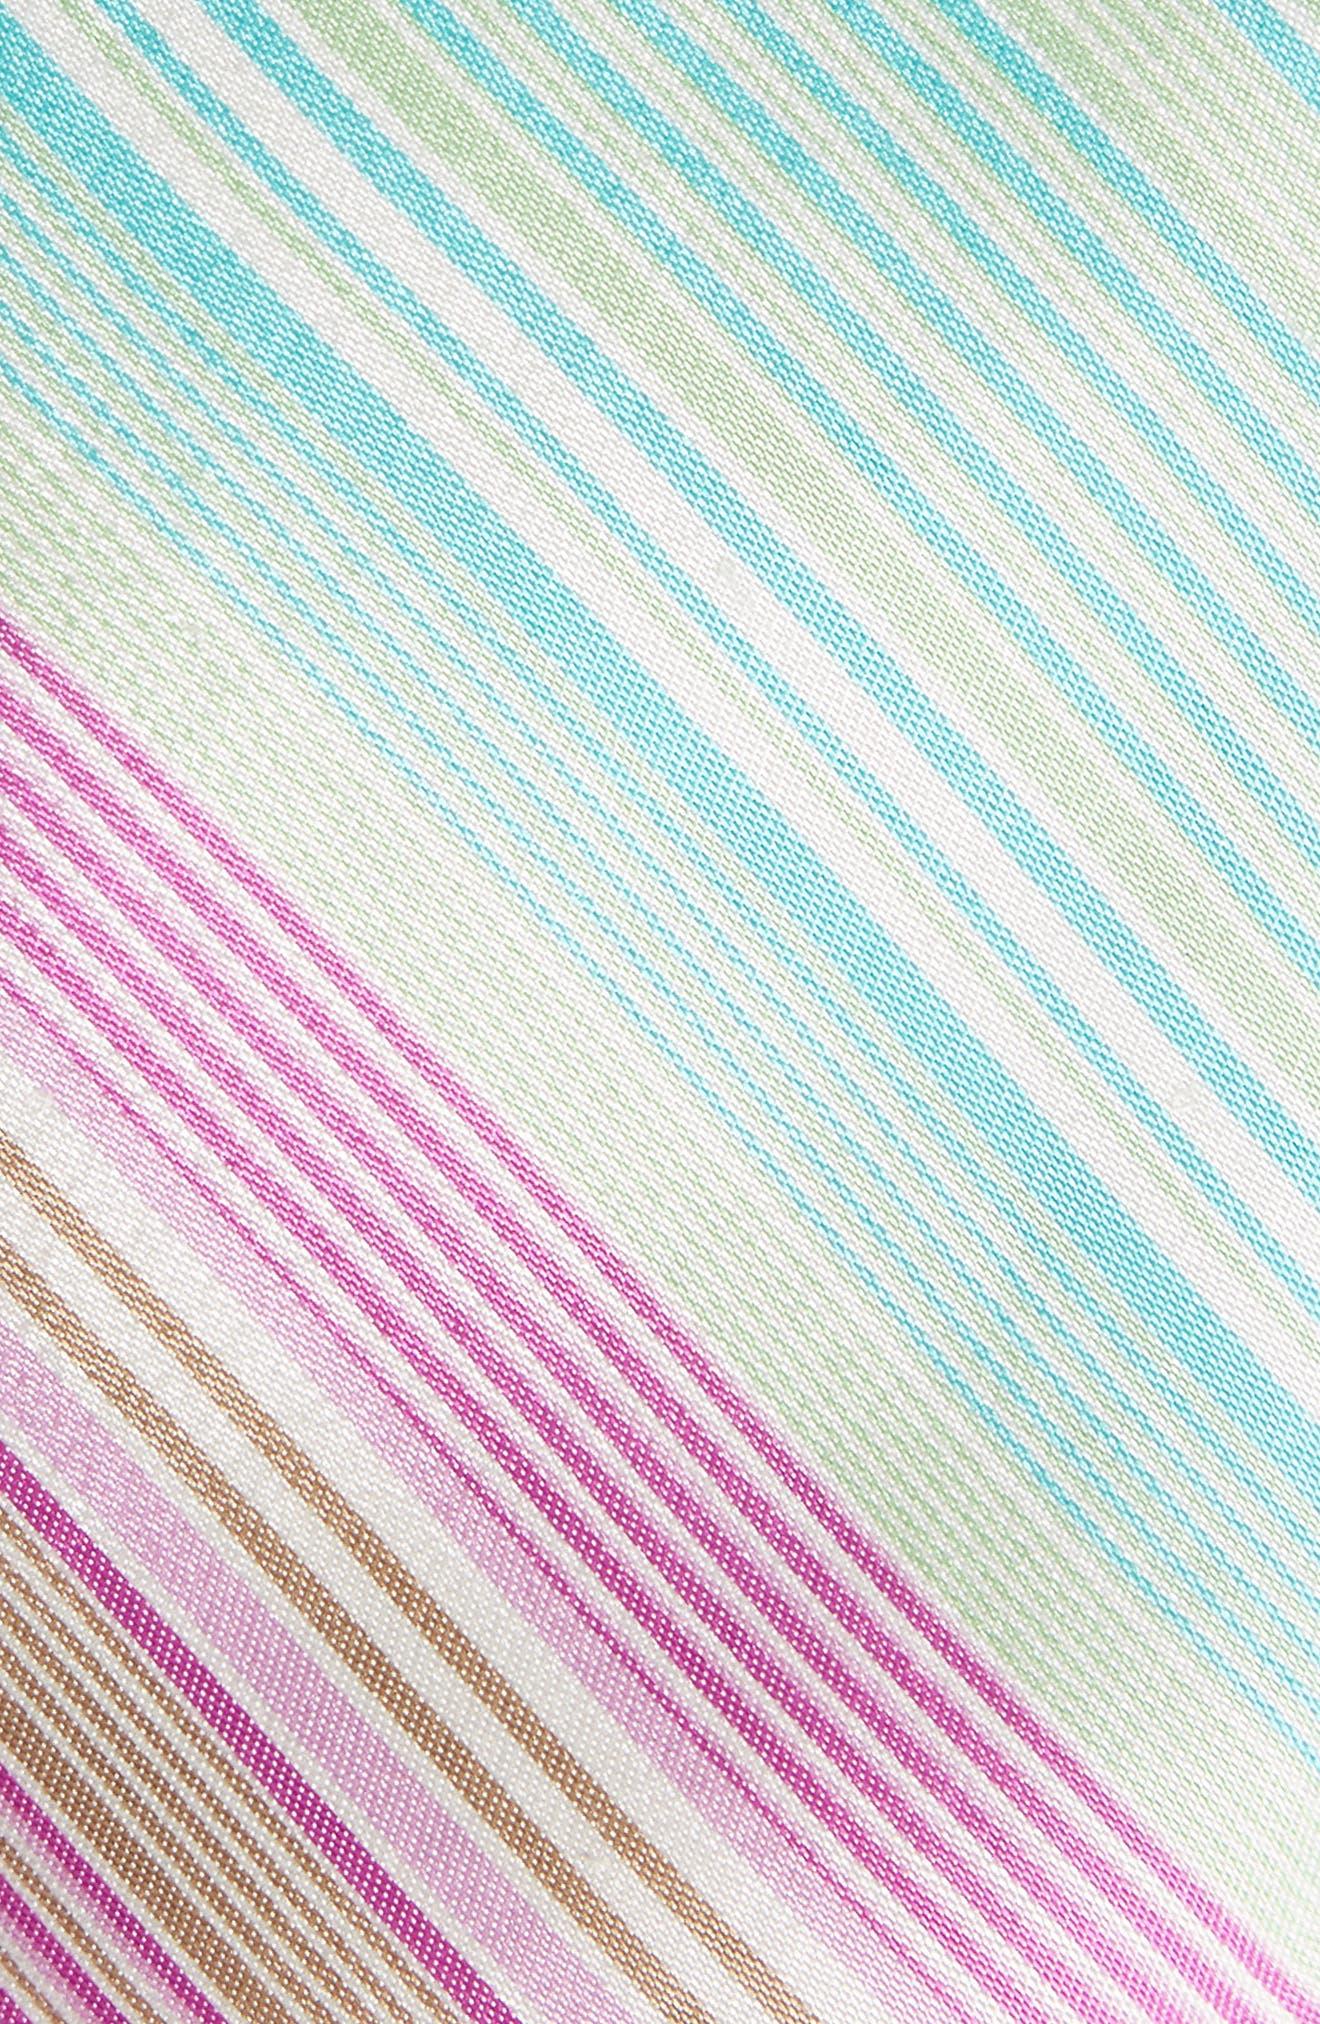 Magnolia Silk Tie,                             Alternate thumbnail 2, color,                             MINT